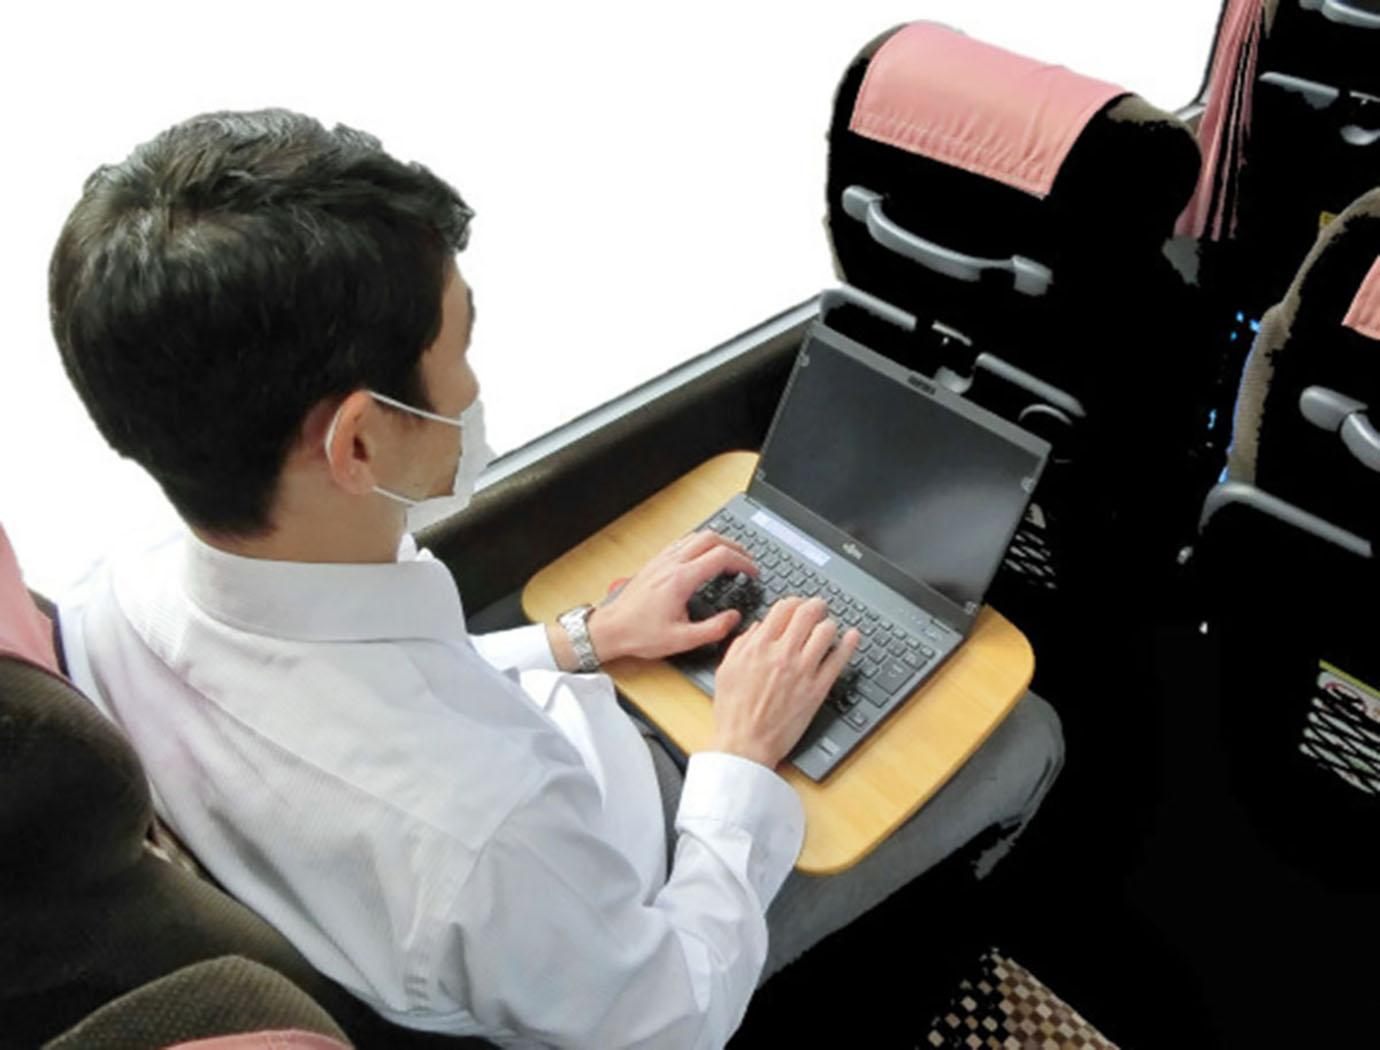 shared-office-bus-tokyo-news